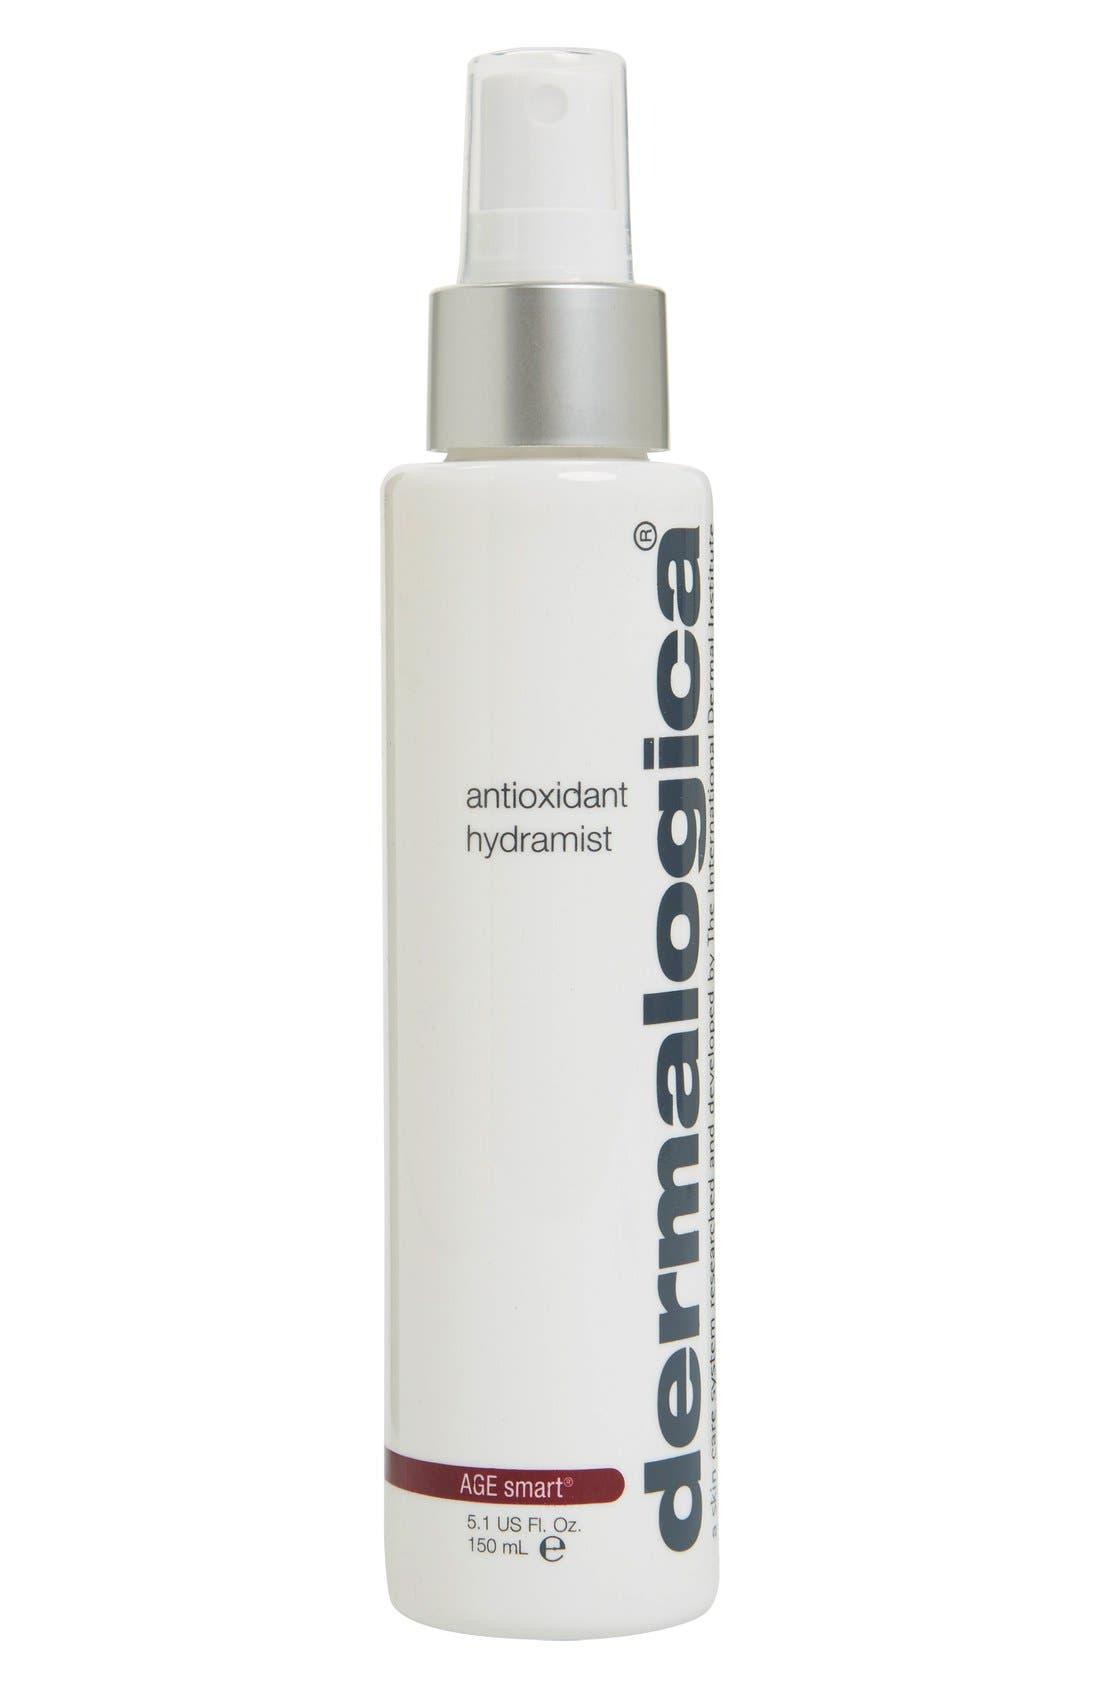 dermalogica® Antioxidant Hydramist